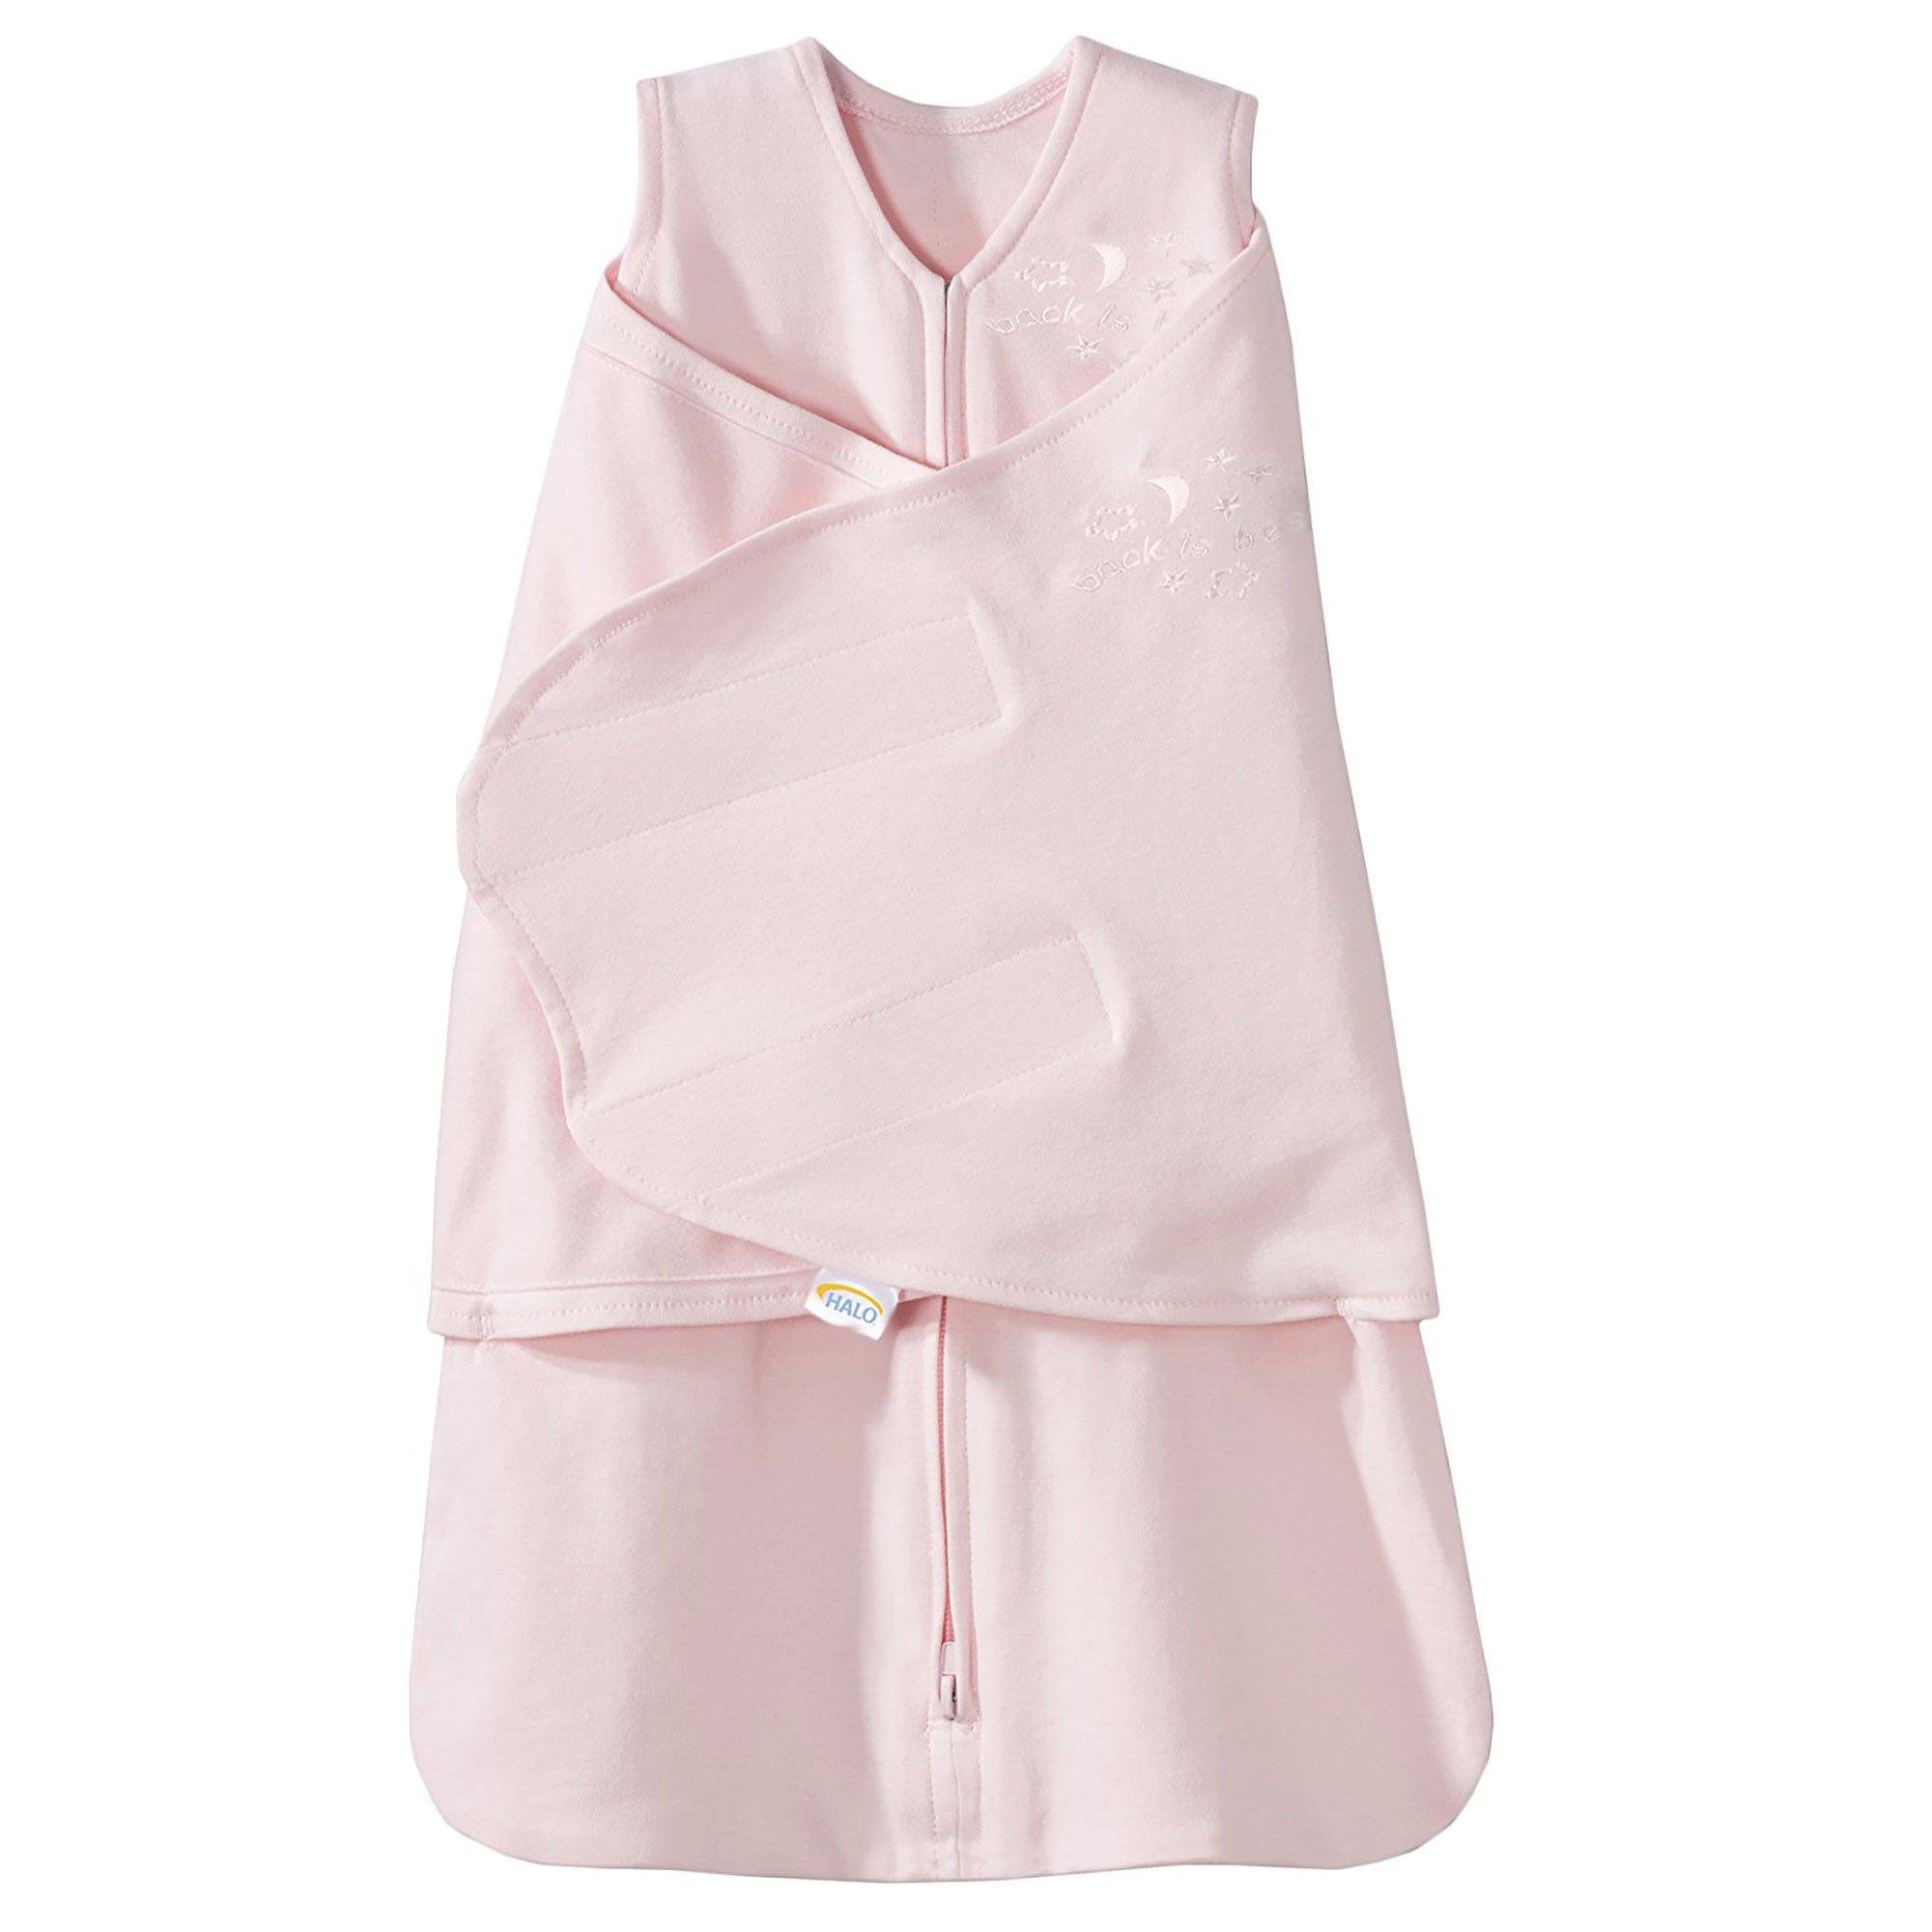 HALO SleepSack 100% Cotton Swaddle, Soft Pink, Newborn by Halo